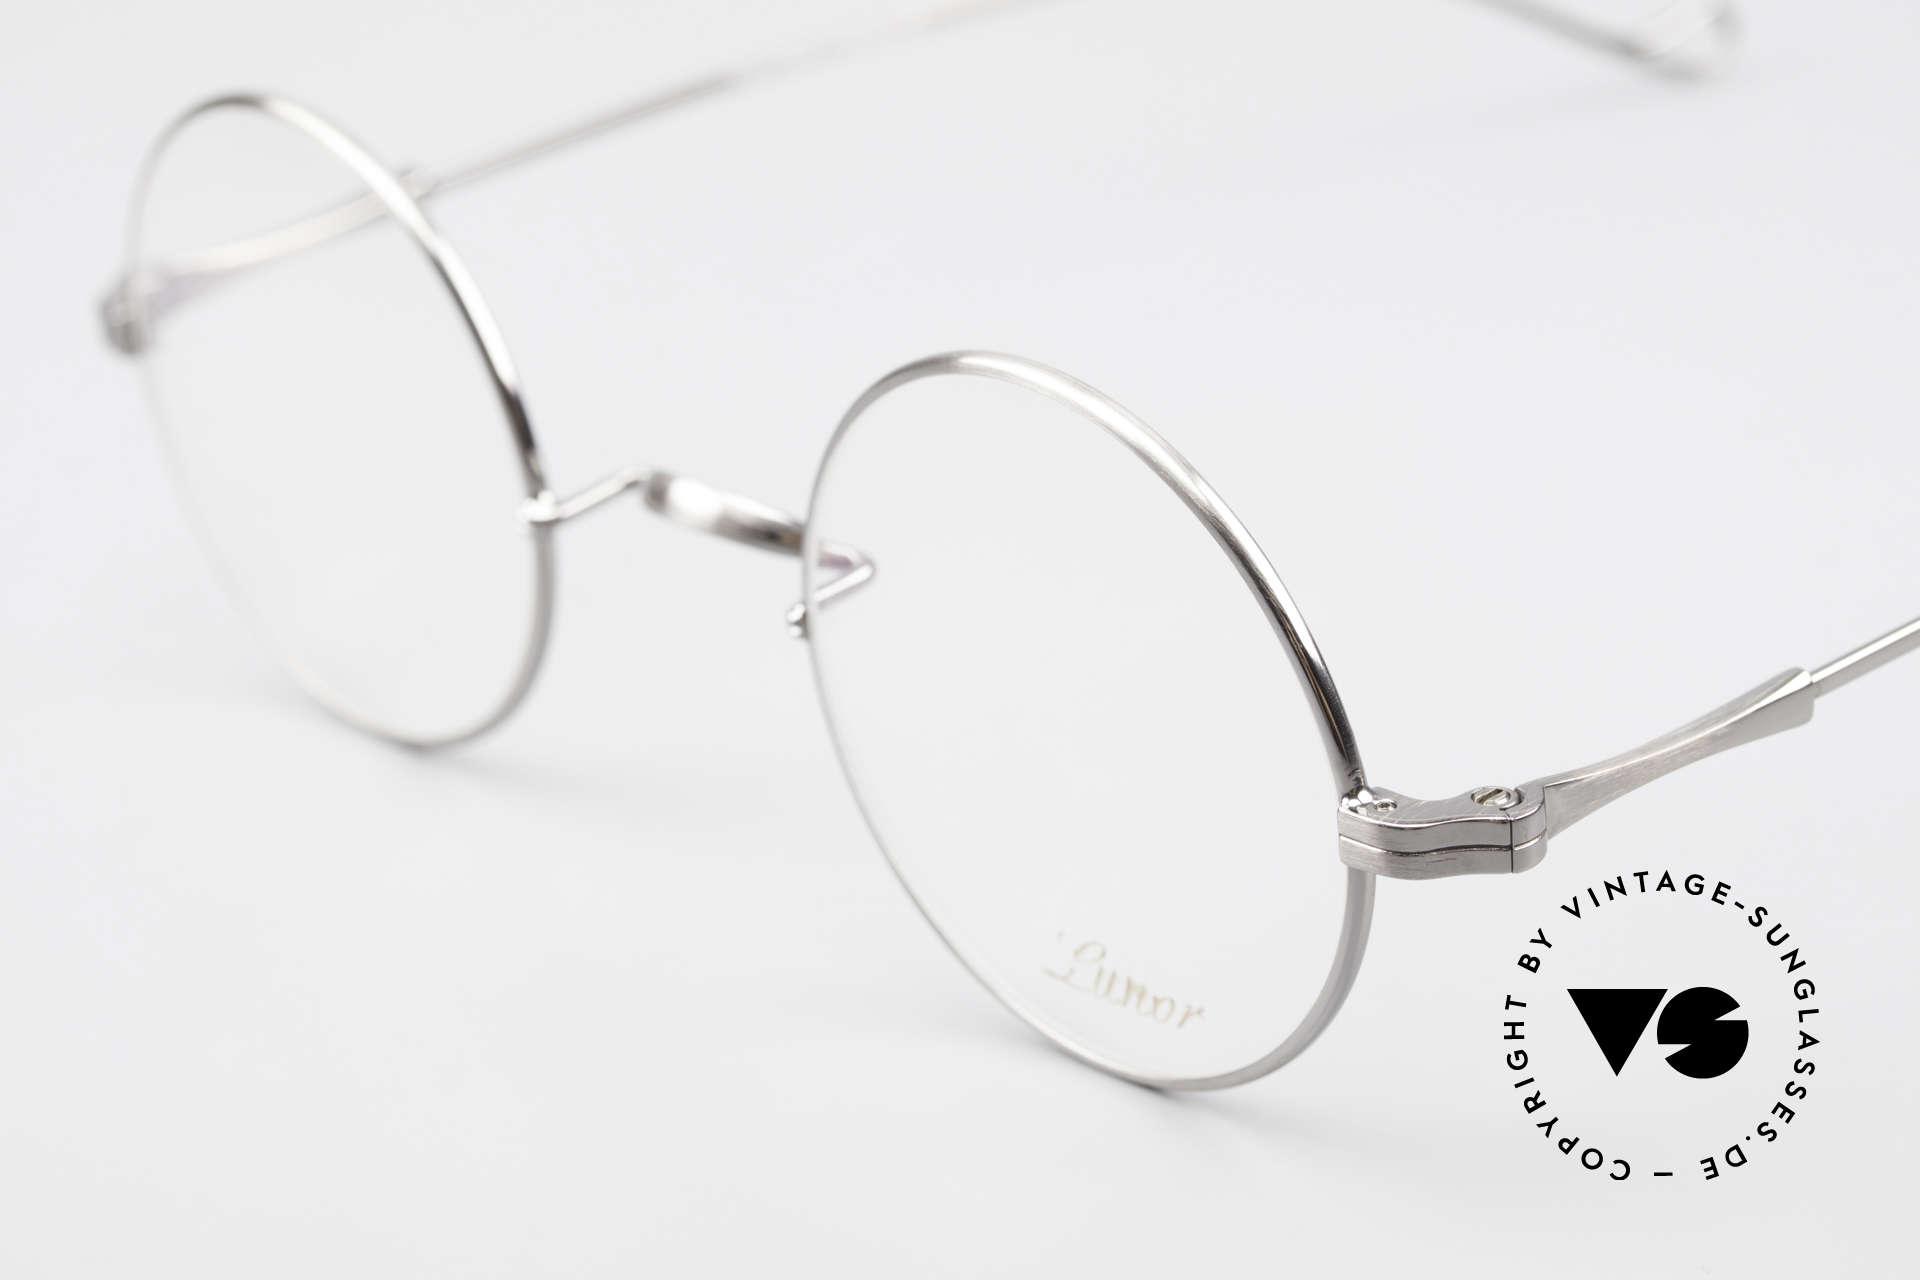 Lunor II 23 Round Frame Antique Silver, noble, classy, timeless = a genuine LUNOR ORIGINAL, Made for Men and Women